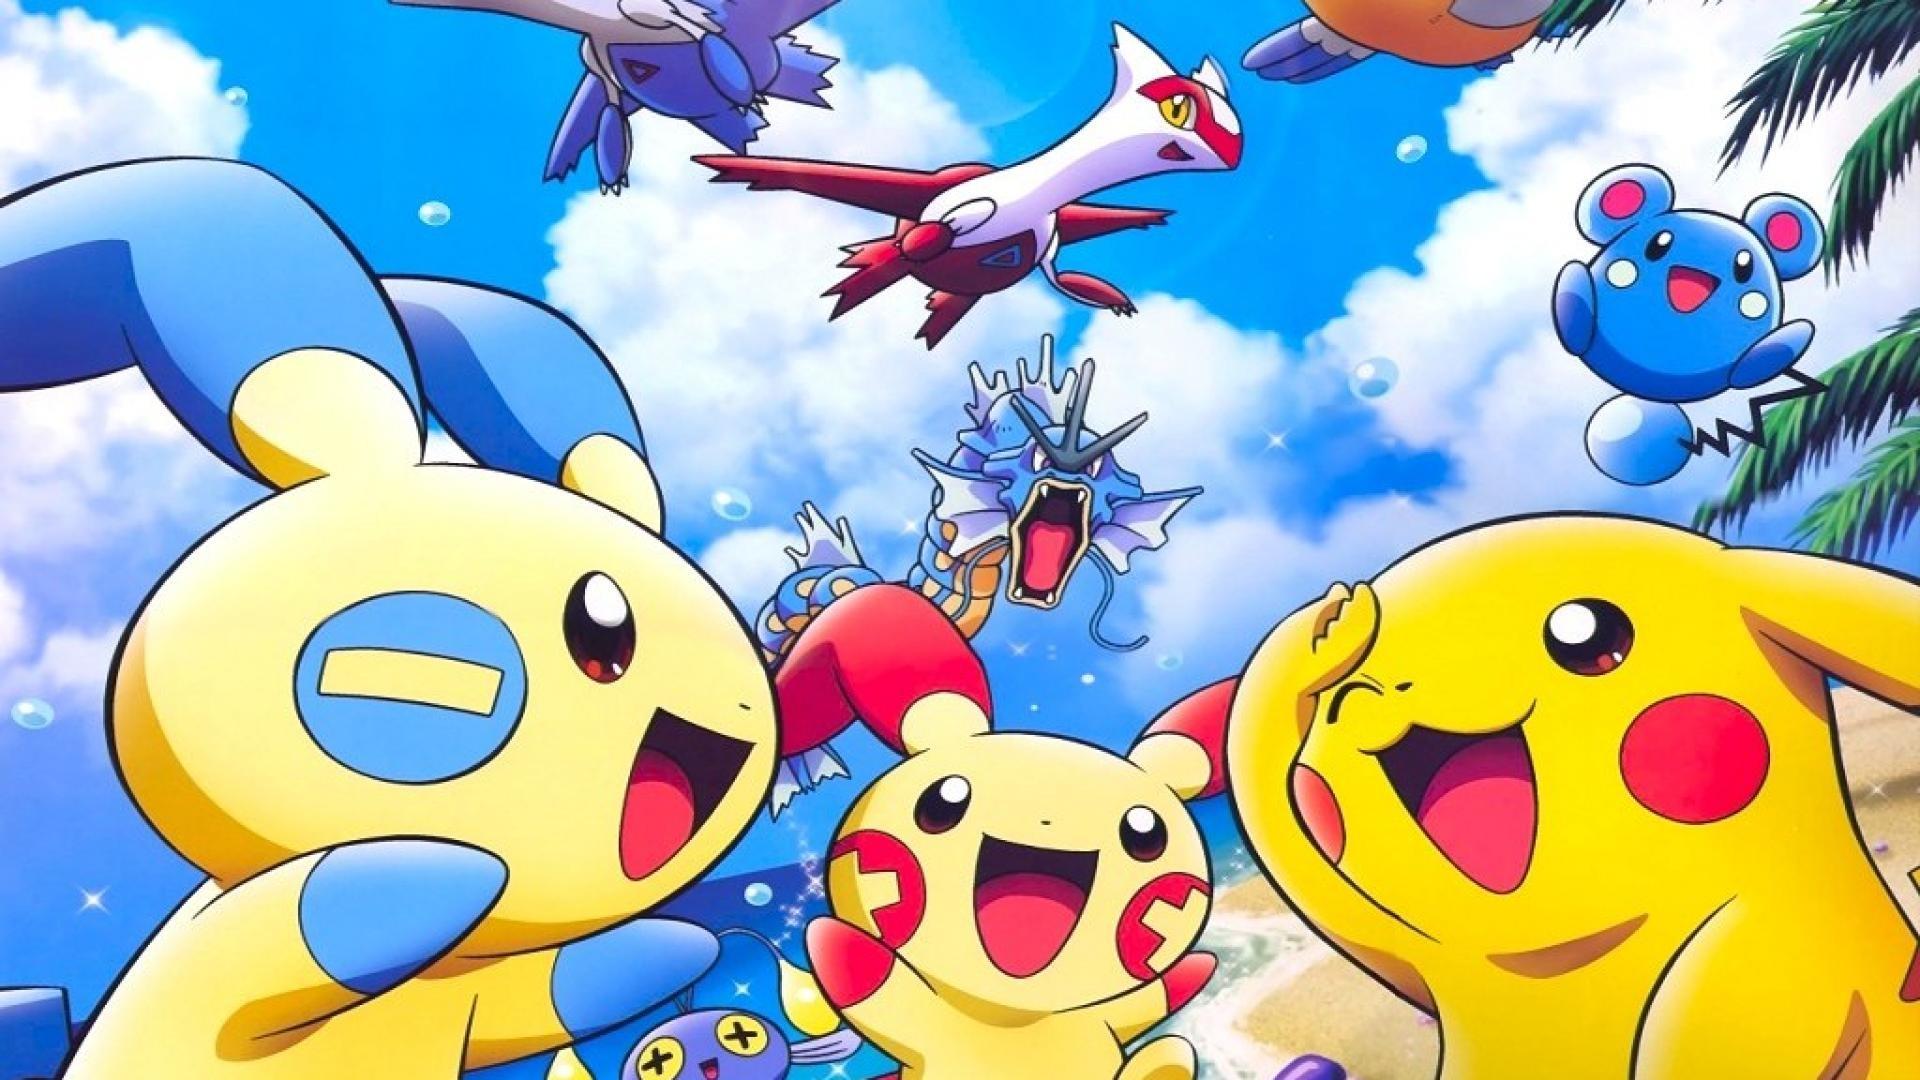 Cute Pokemon Wallpaper Widescreen